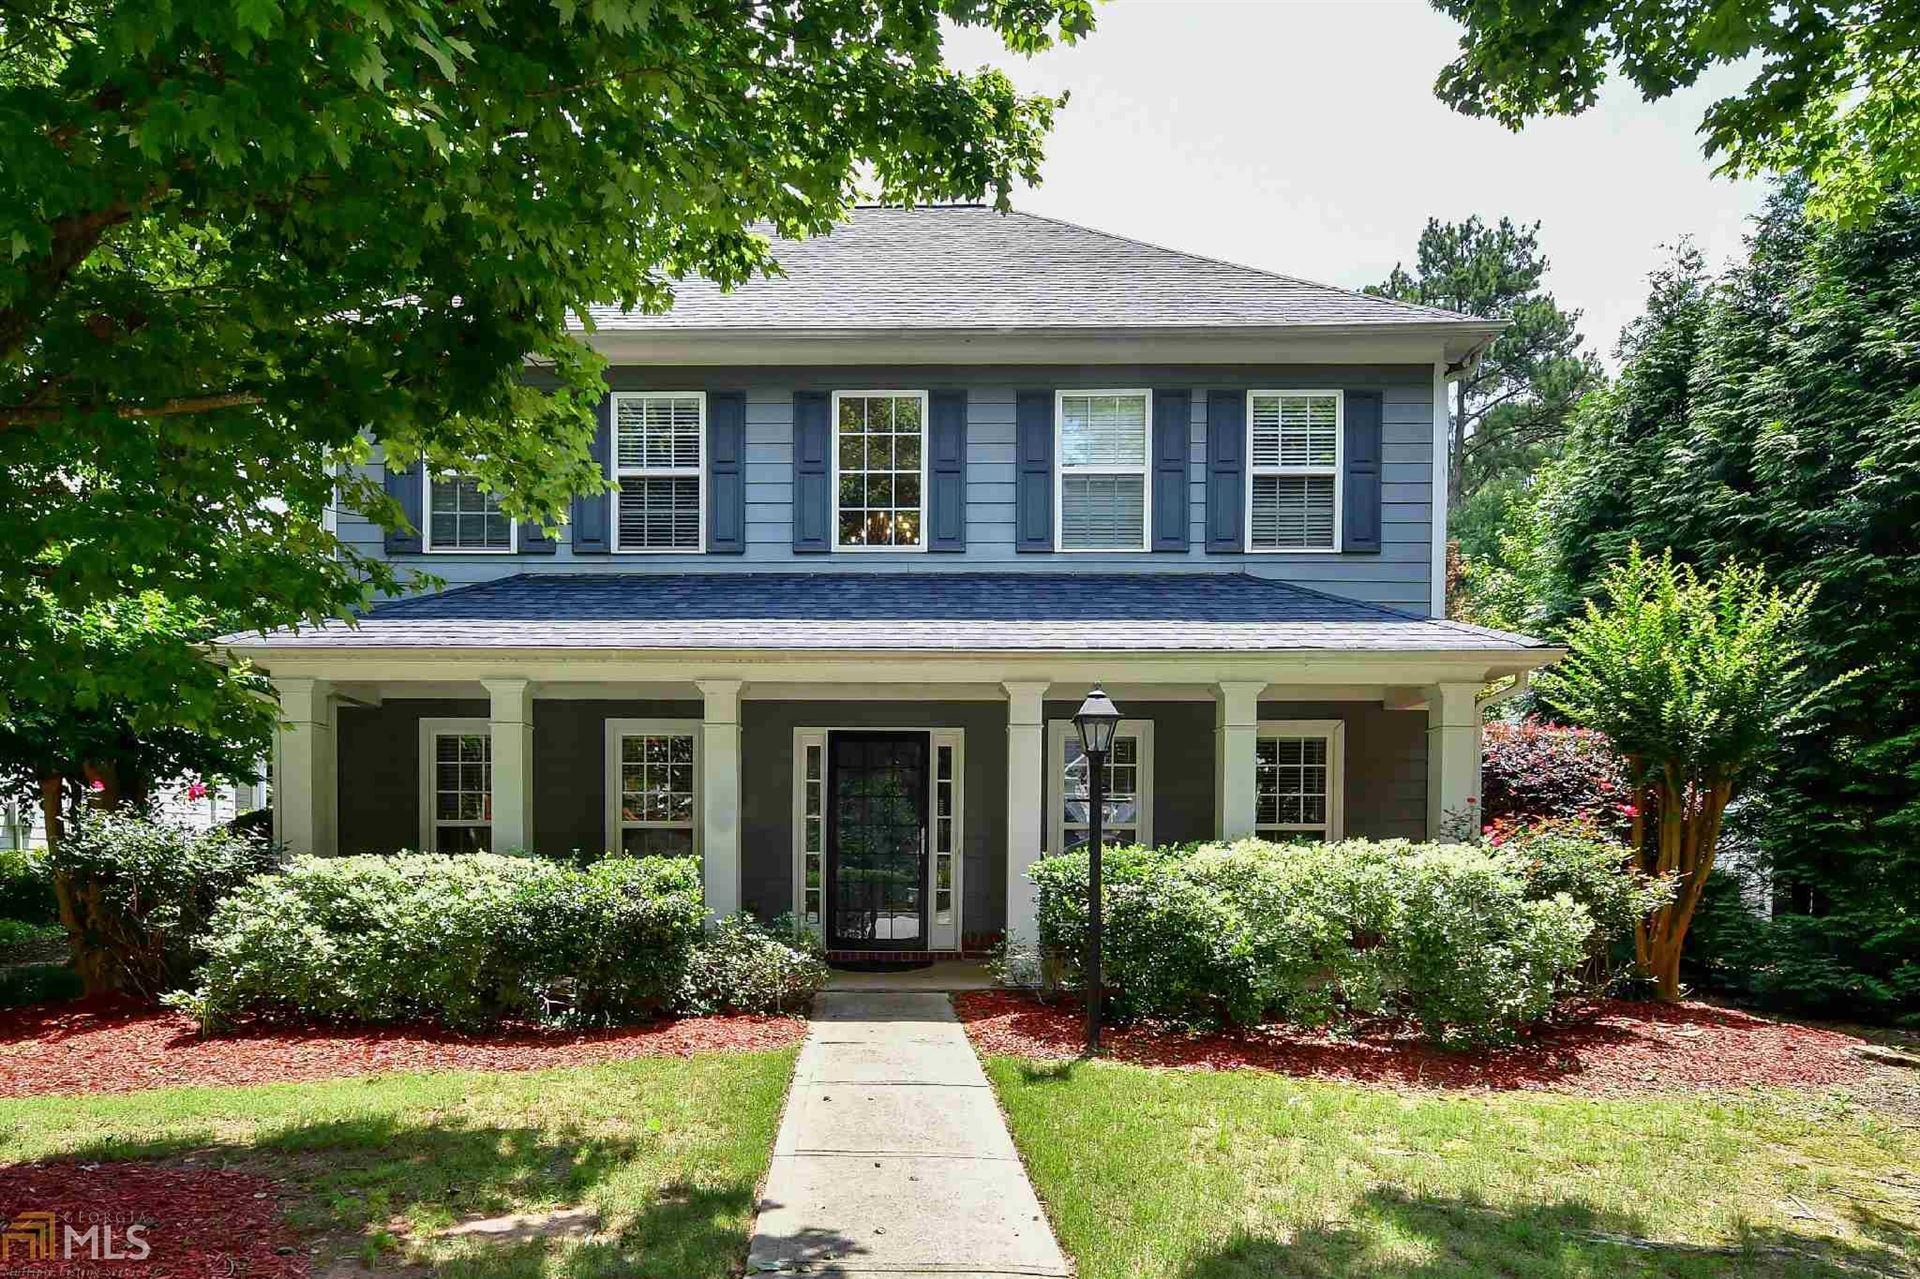 1260 Crescentwood Ln, Decatur, GA 30032 - #: 8787517